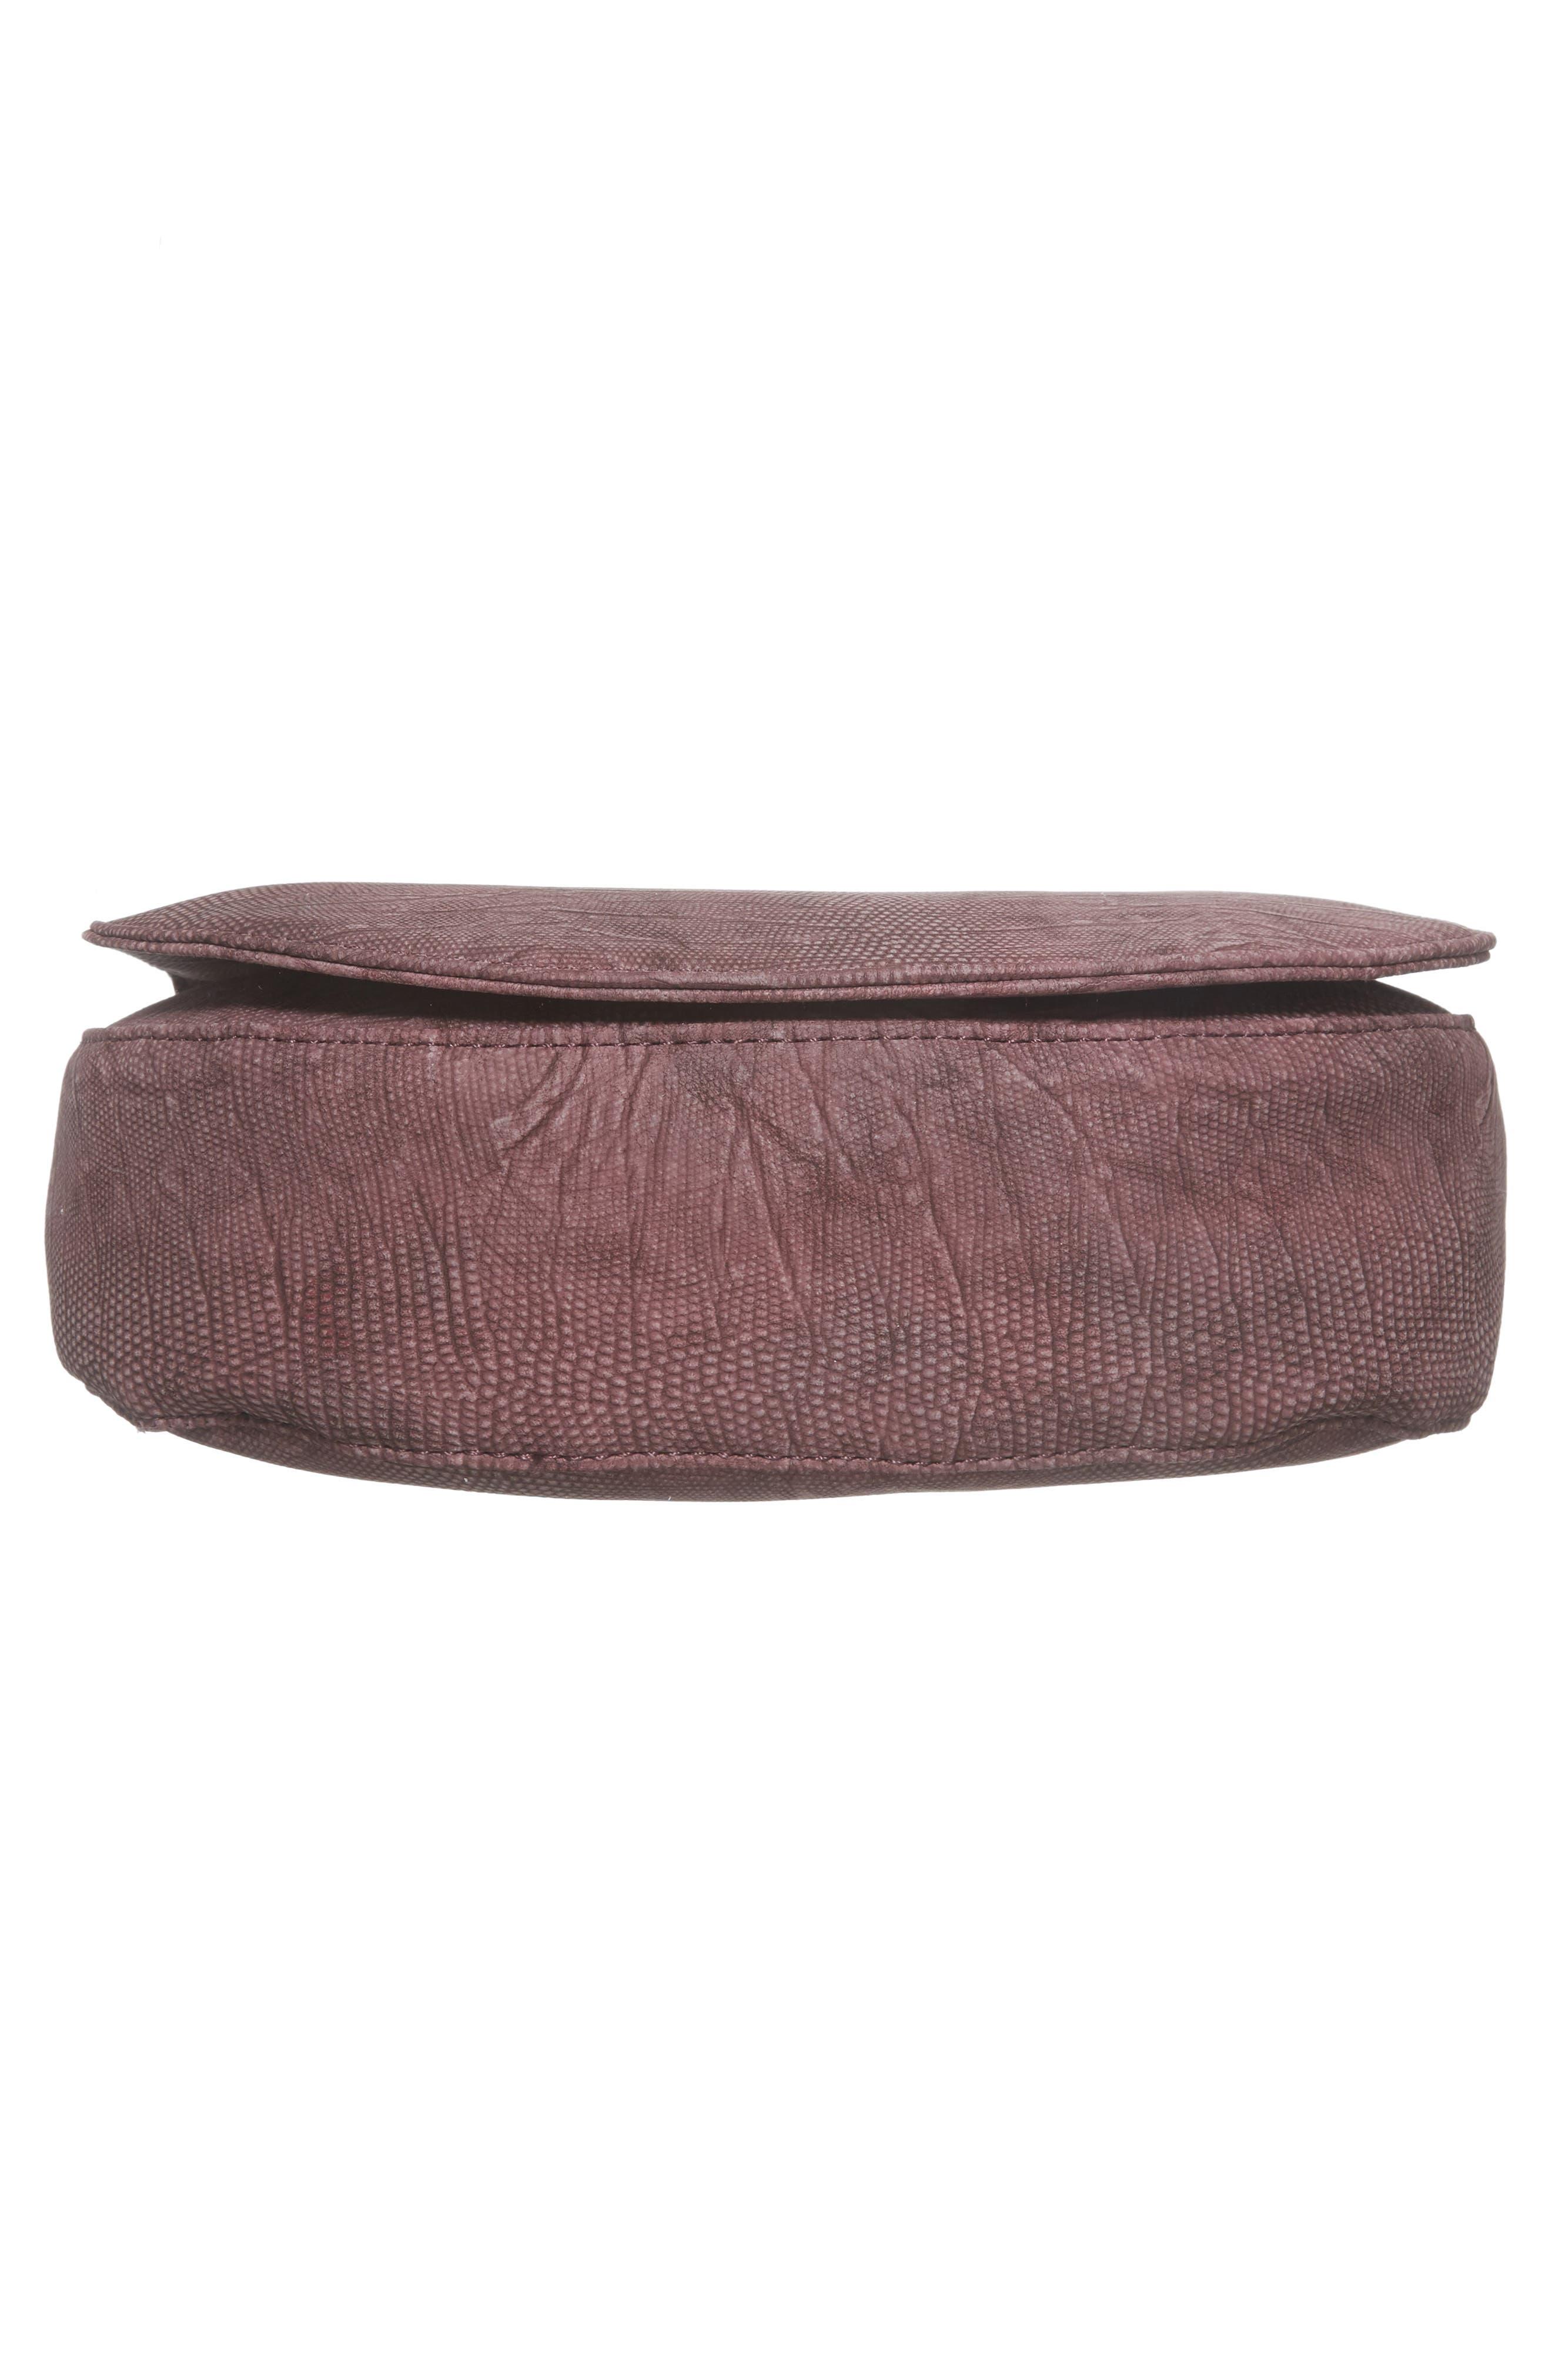 Livvy Faux Leather Crossbody Saddle Bag,                             Alternate thumbnail 18, color,